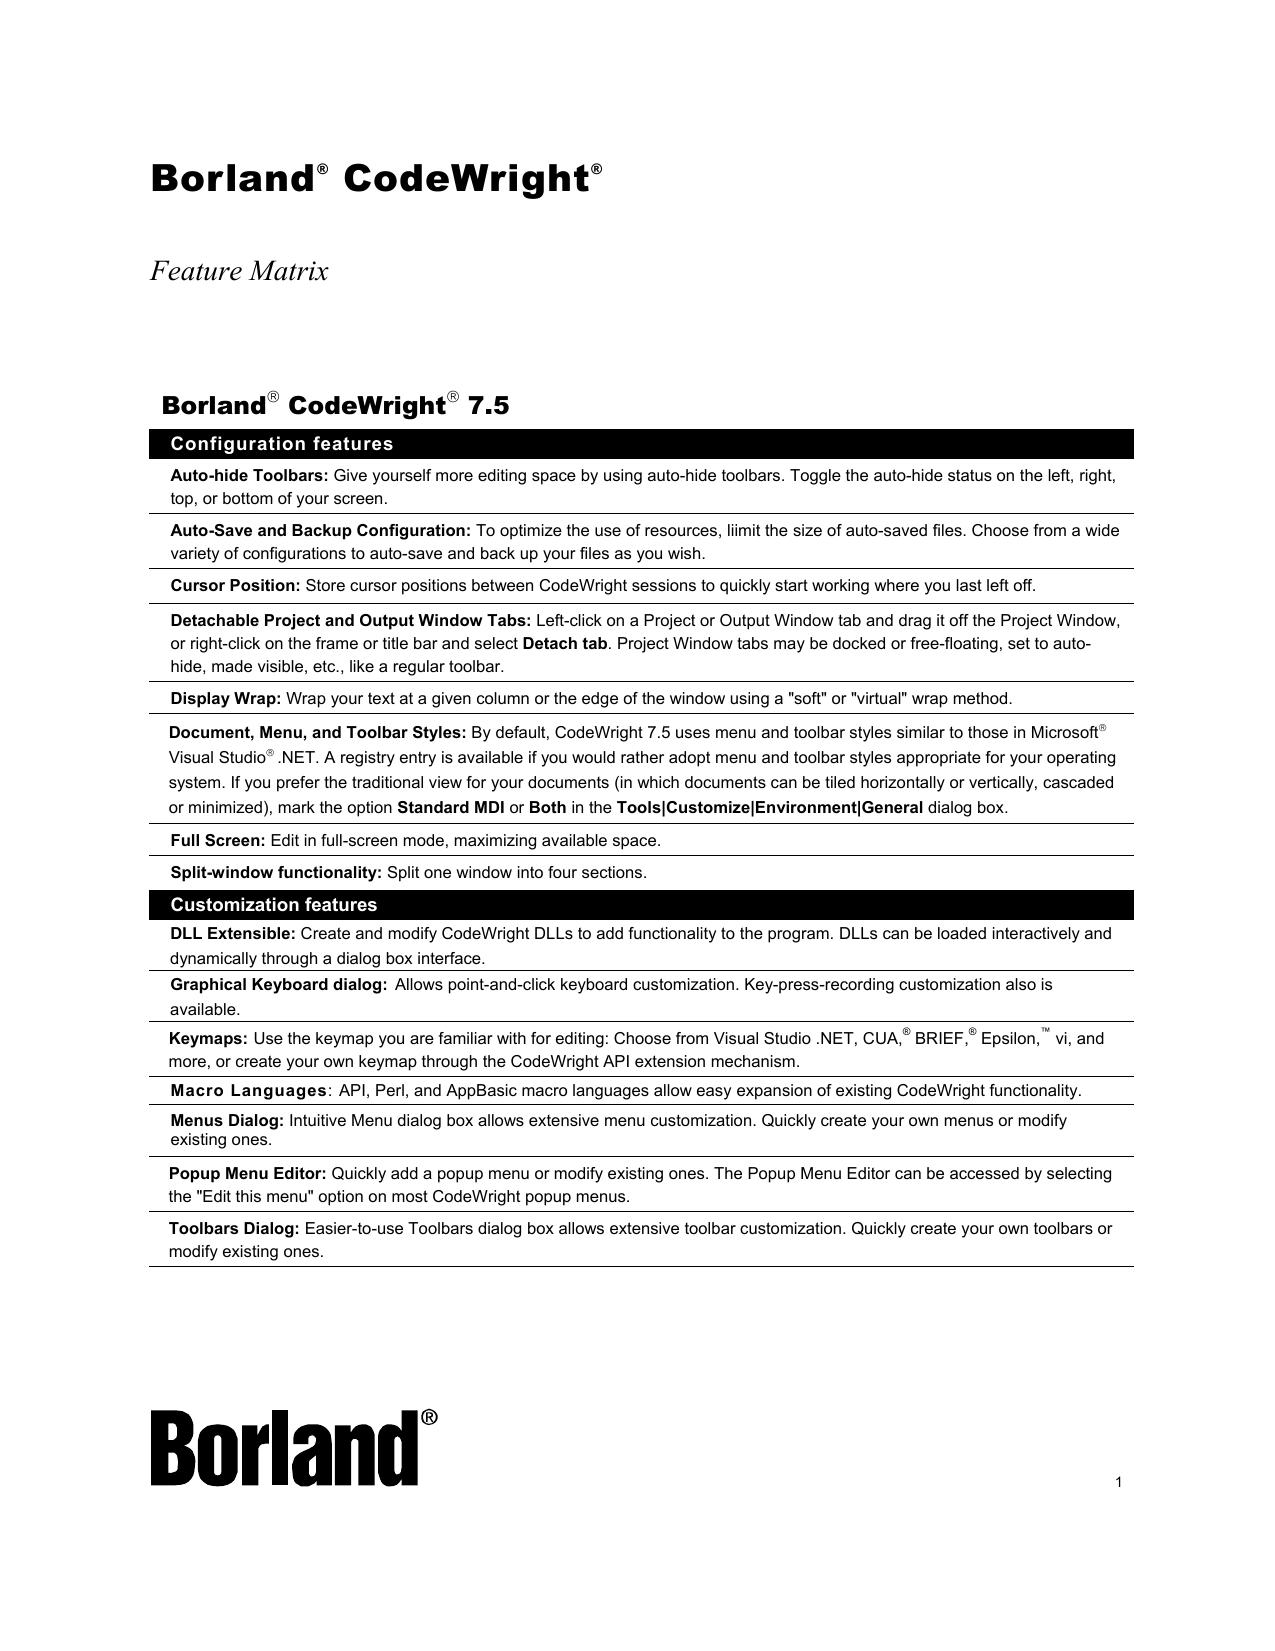 nautilus nt 907 user manual